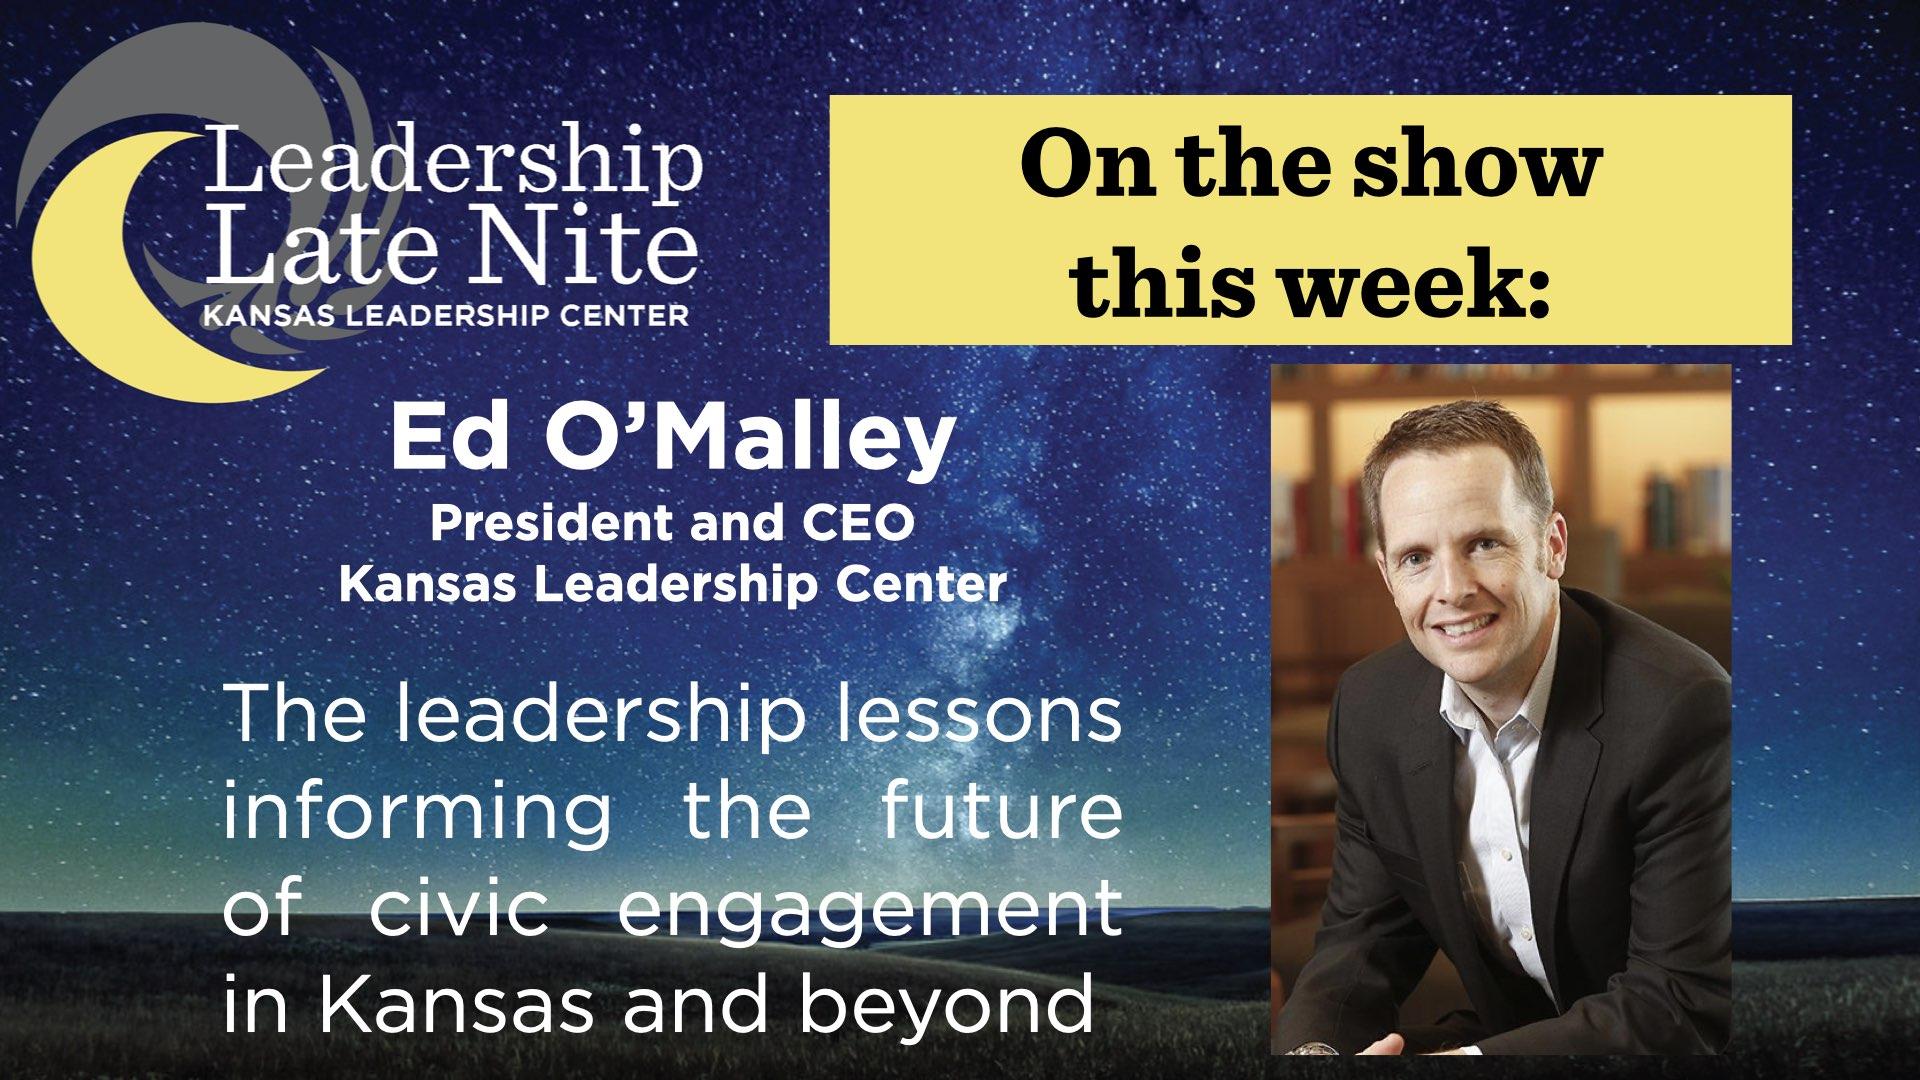 Ed O'Malley on Leadership Late Nite